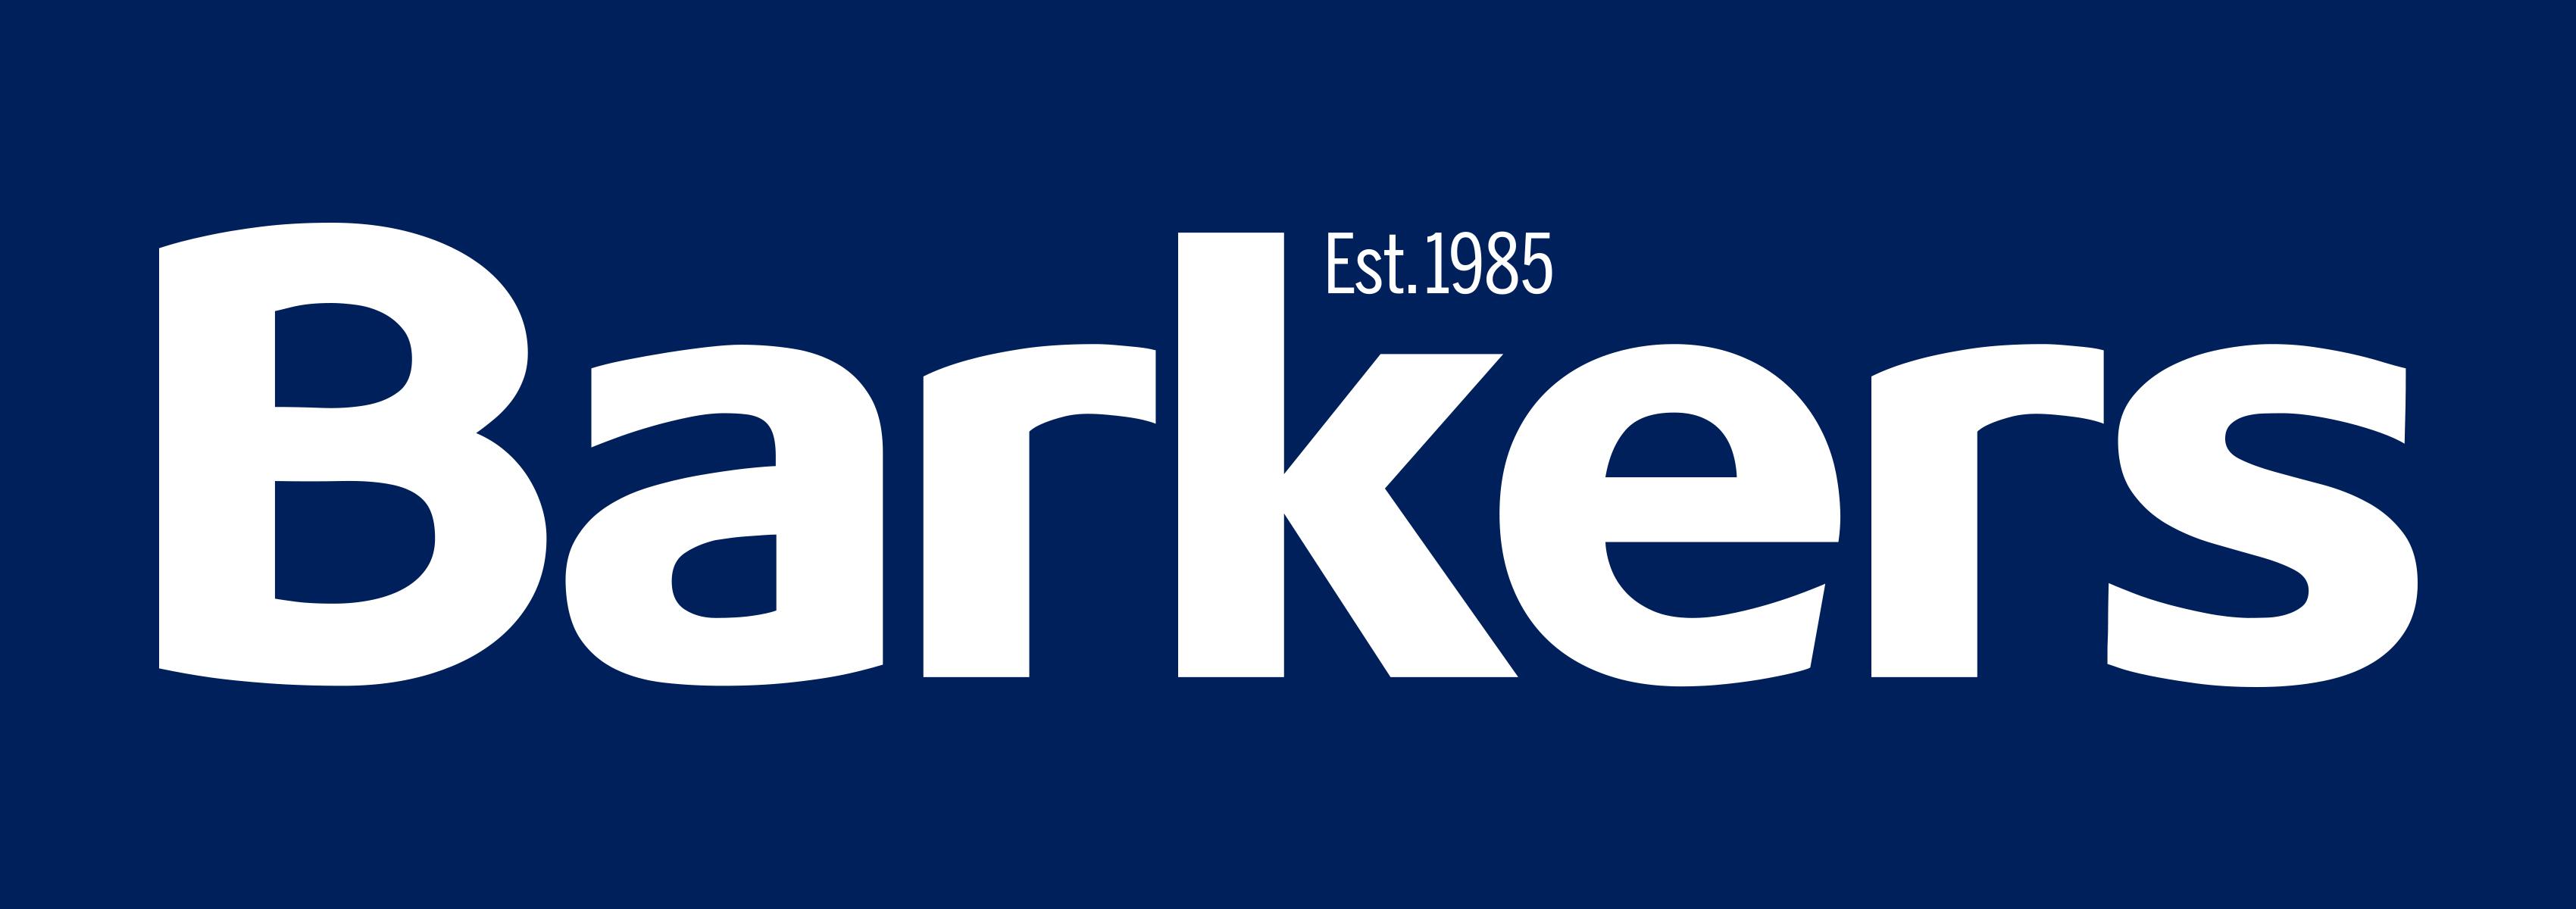 Barkers Estate Agents